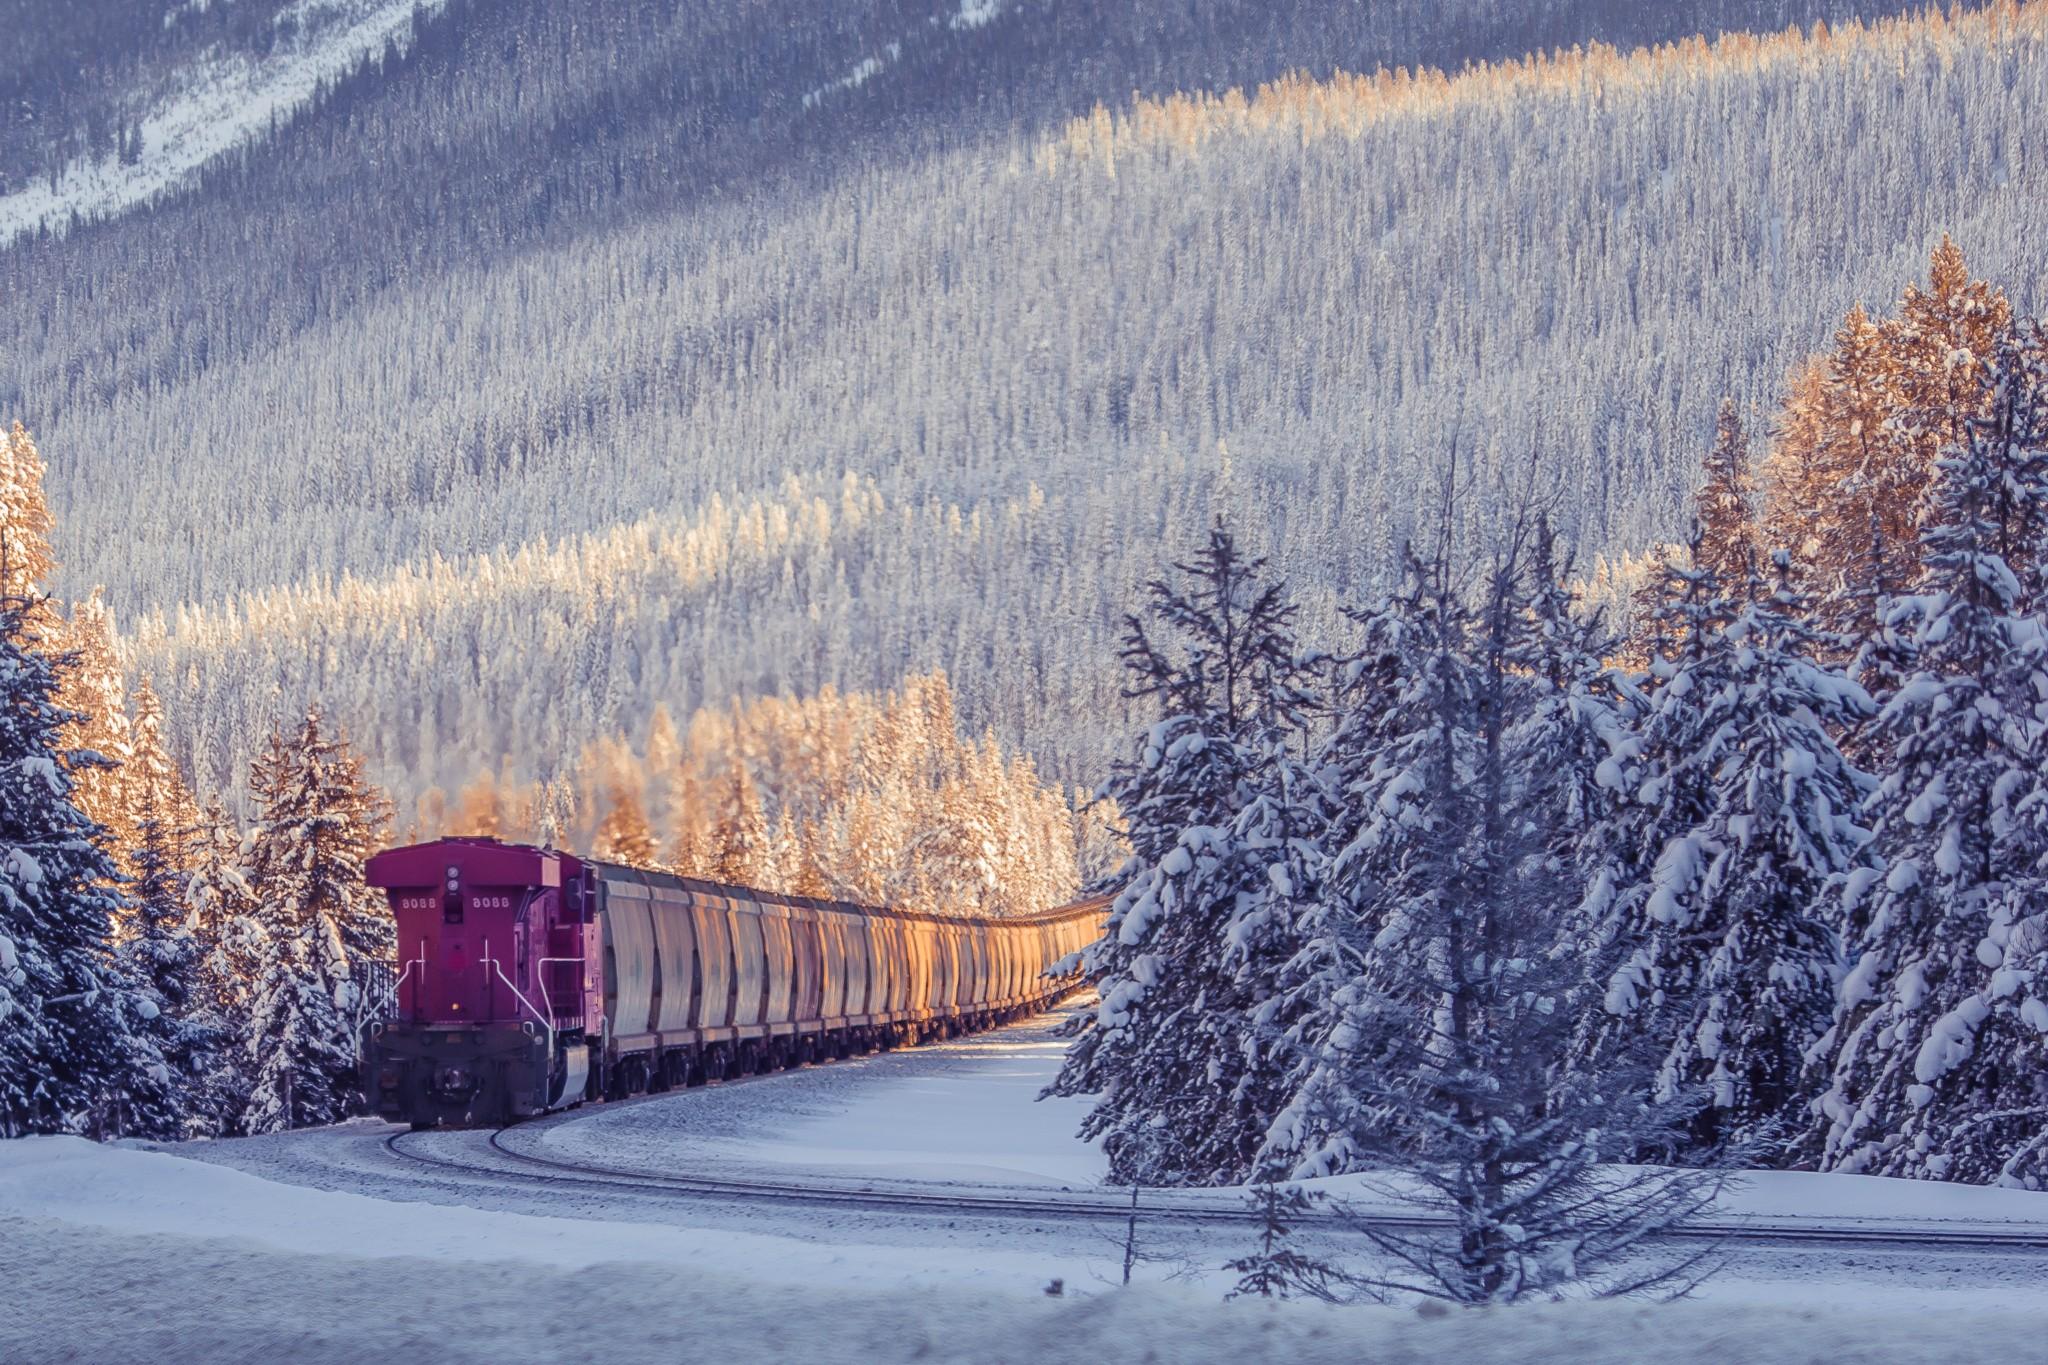 железная дорога картинки зимняя интернете найти фото